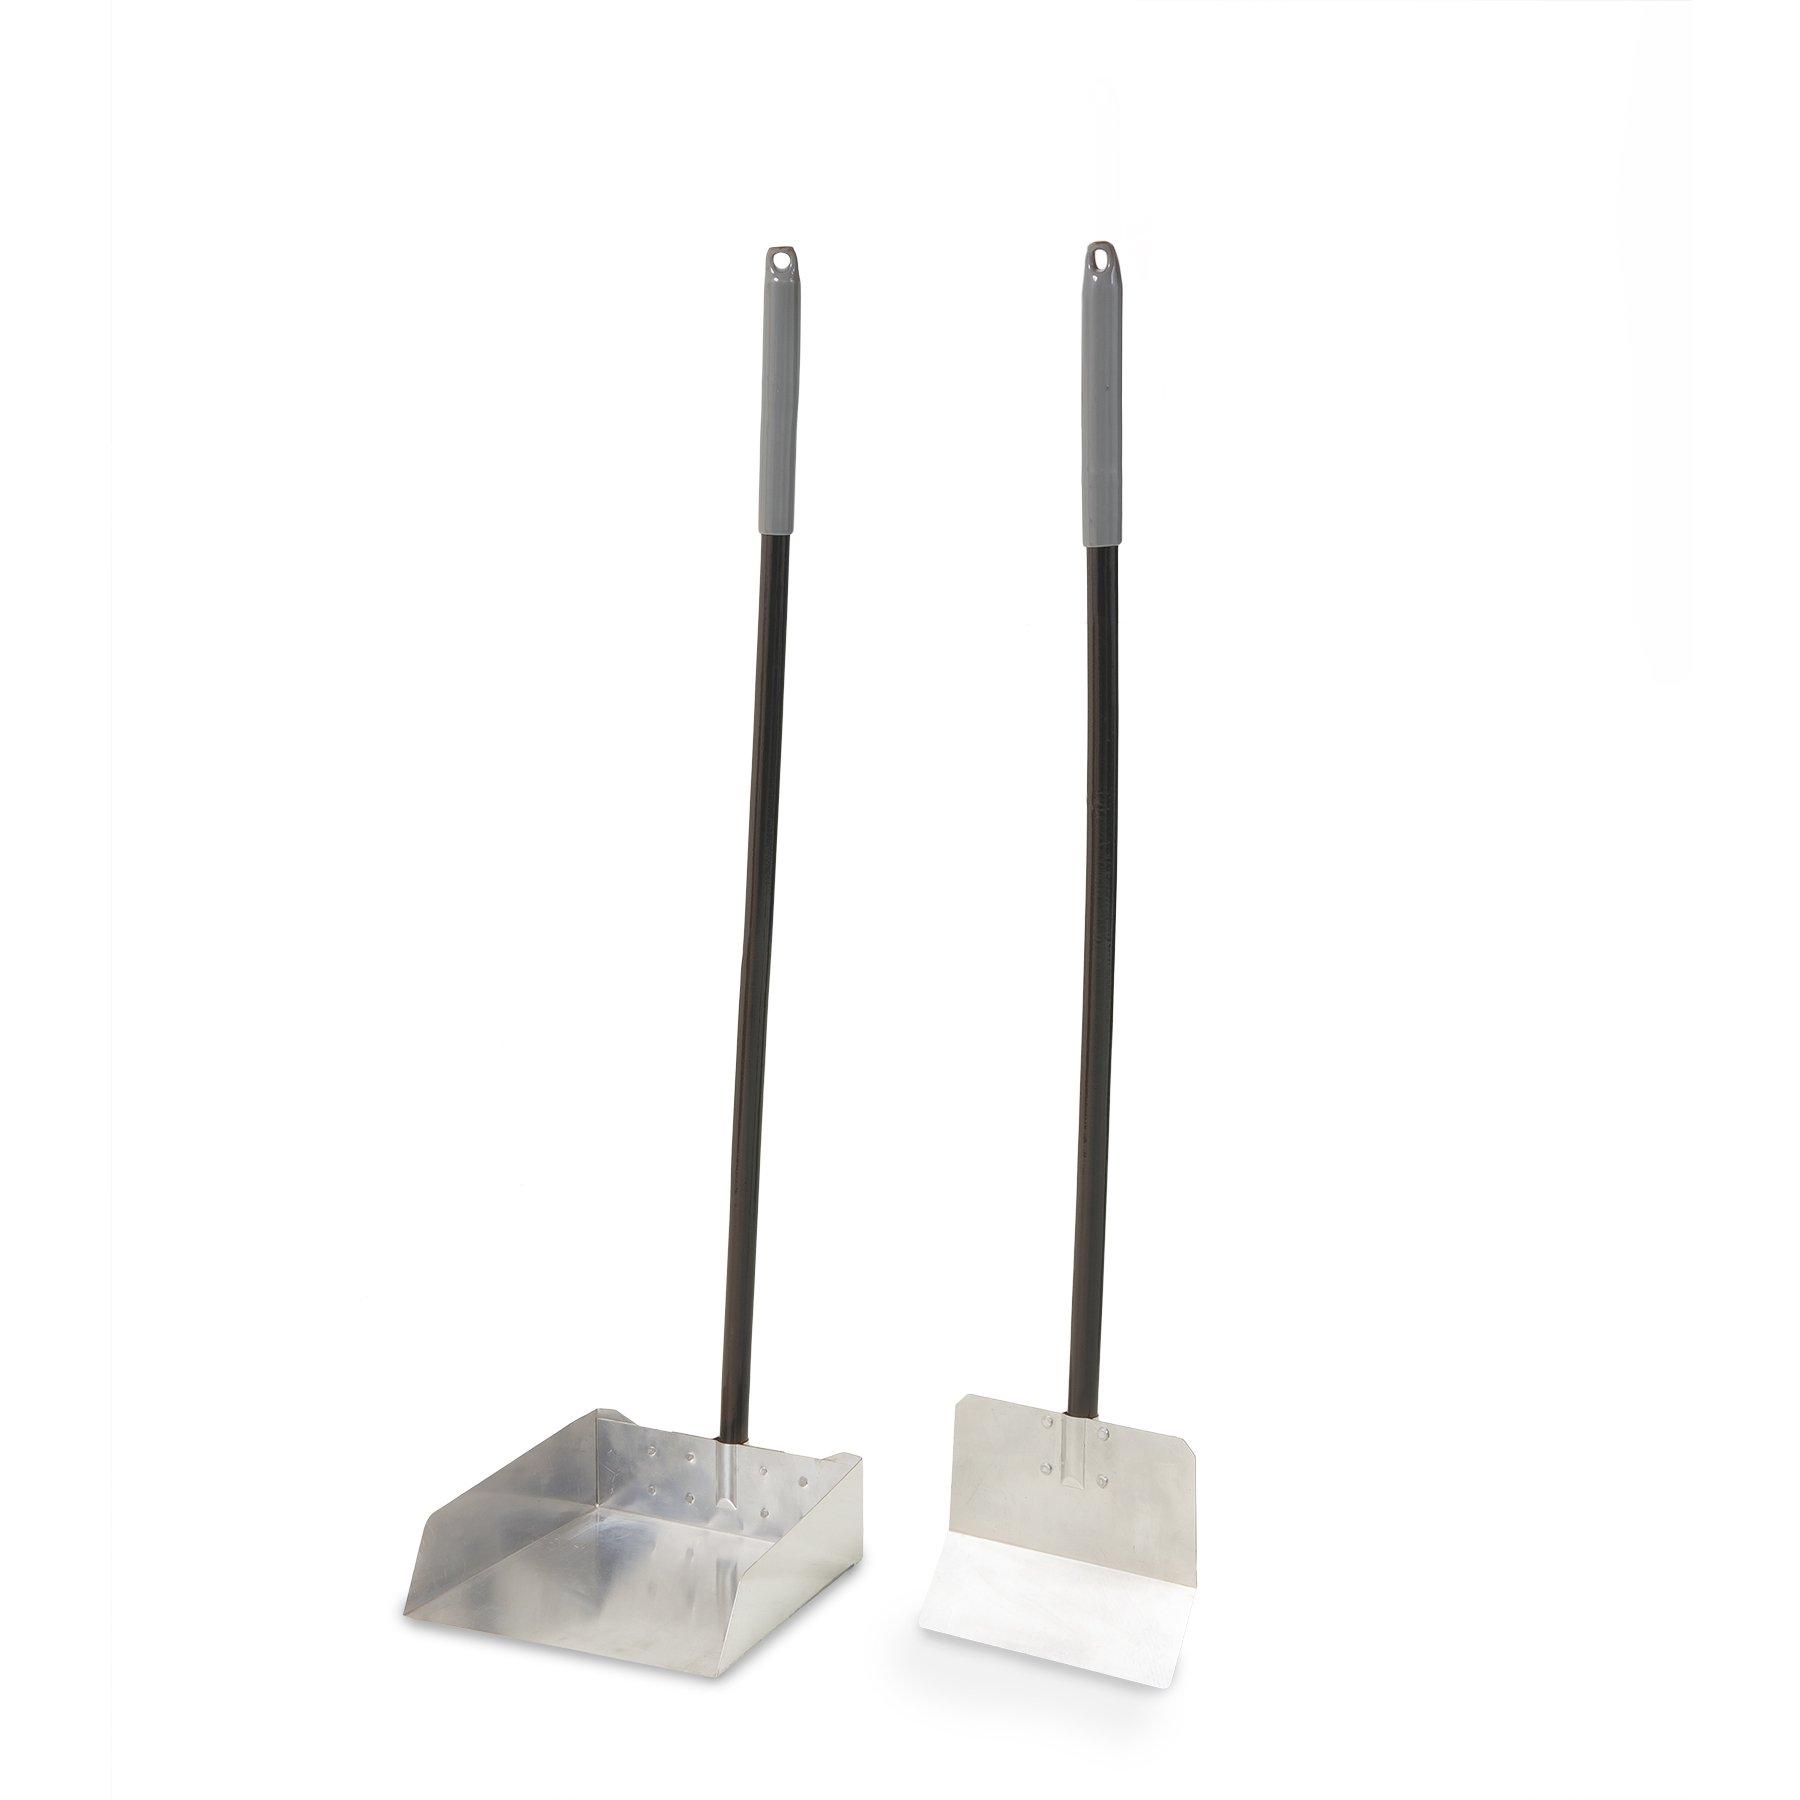 Petmate Clean Response Aluminum Spade and Pan, Large